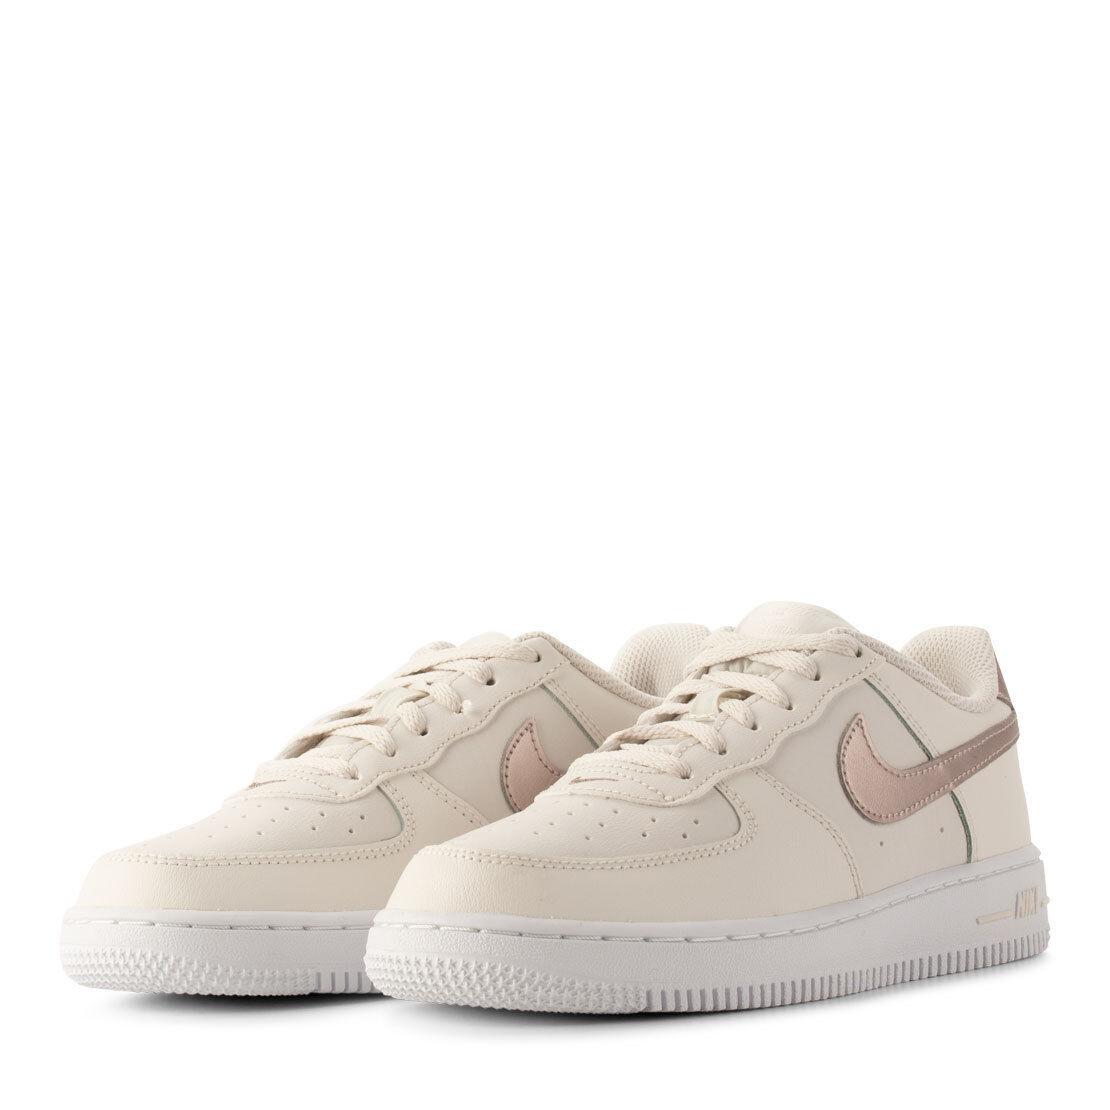 Scarpe sport bambina NIKE Air Force 1 PS pelle bianco crema e bronzo 314220 021